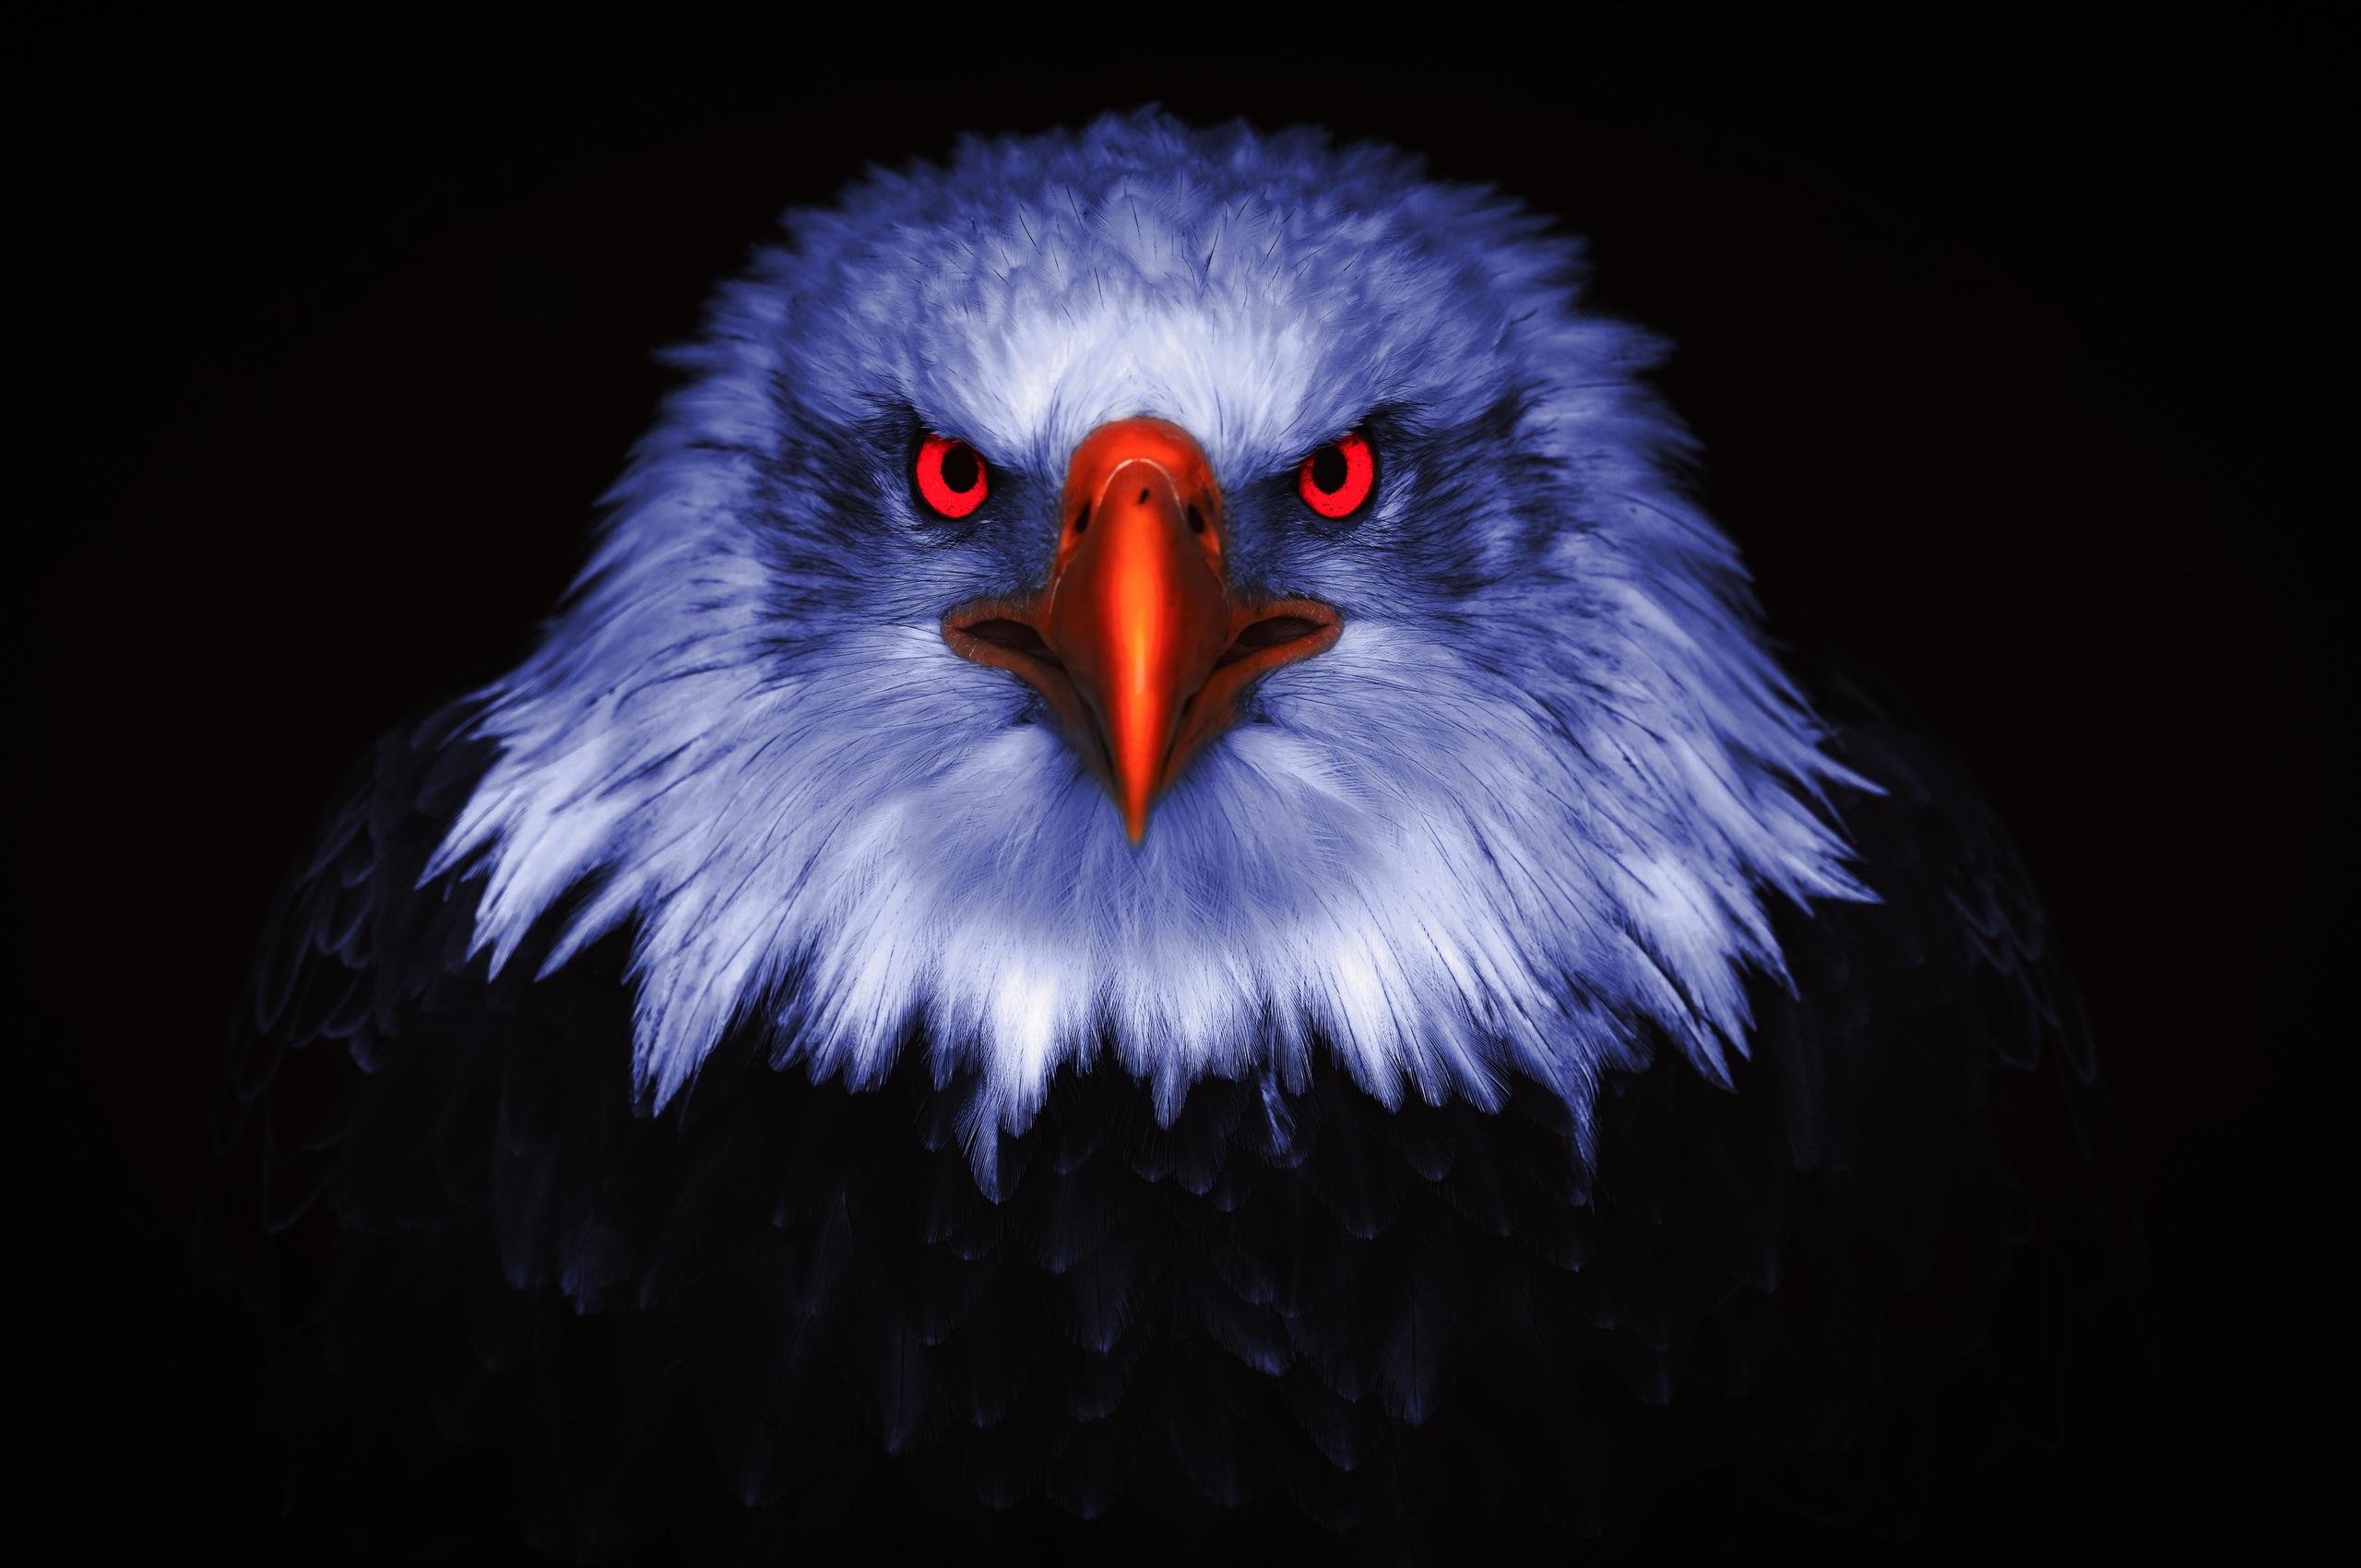 eagle-raptor-eyes-8k-xr.jpg